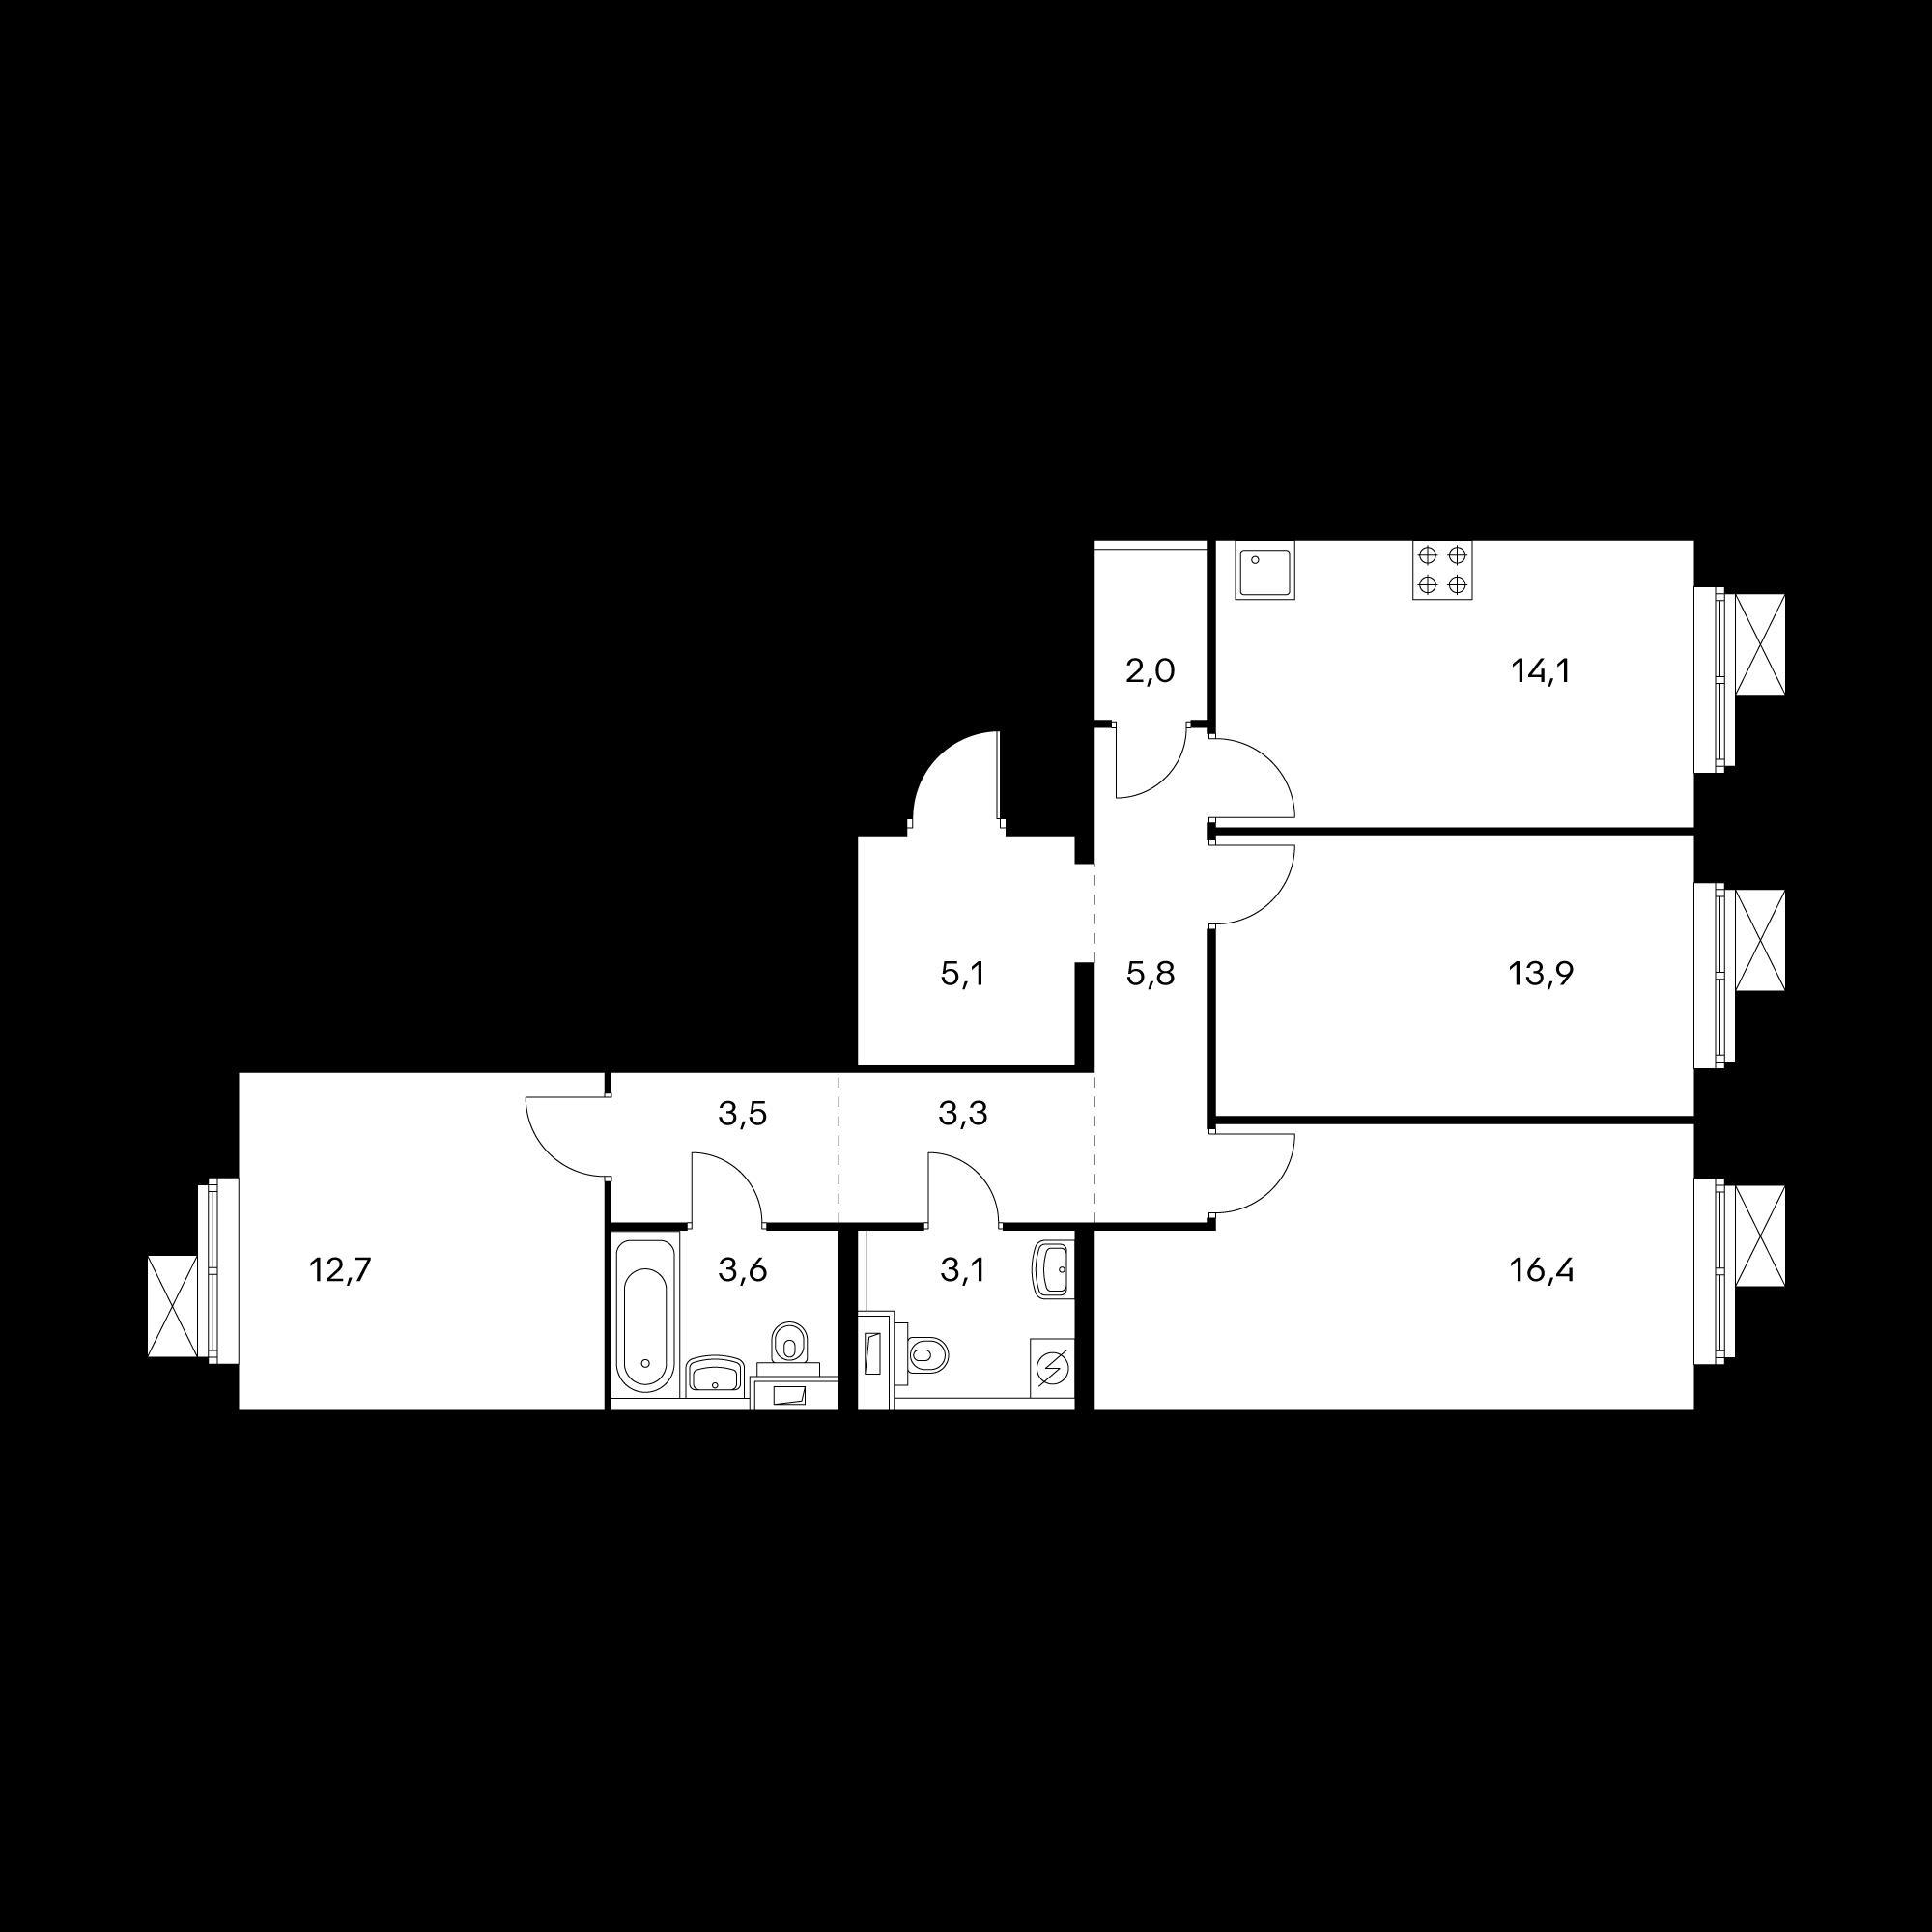 3KL13_9.0-1*